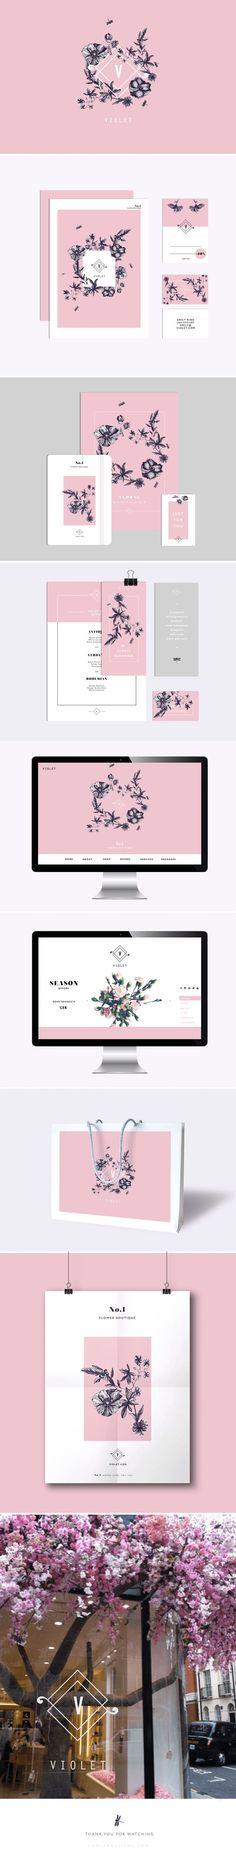 Violet Flower Boutique Branding | Fivestar Branding – Design and Branding Agency & Inspiration Gallery